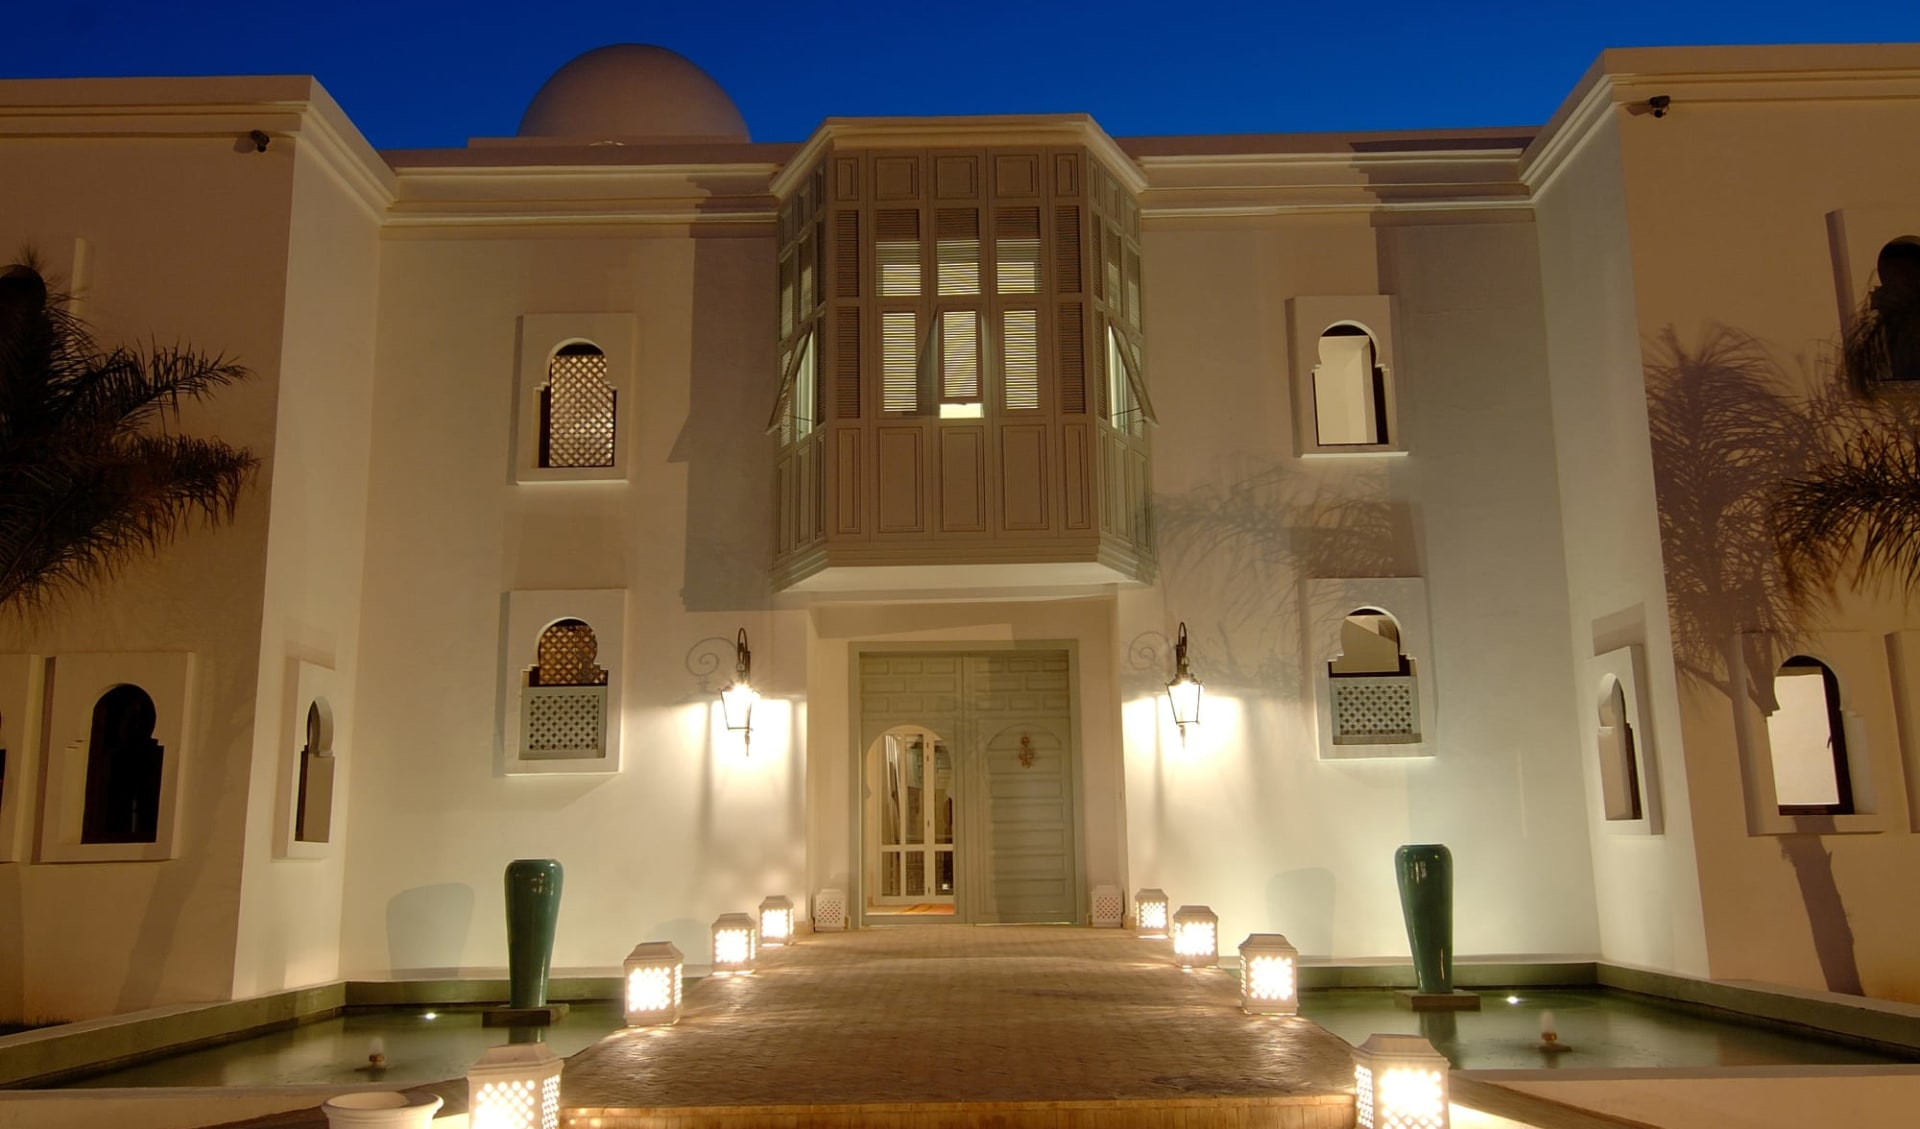 Riad Villa Blanche in Agadir:  façade nuit 1